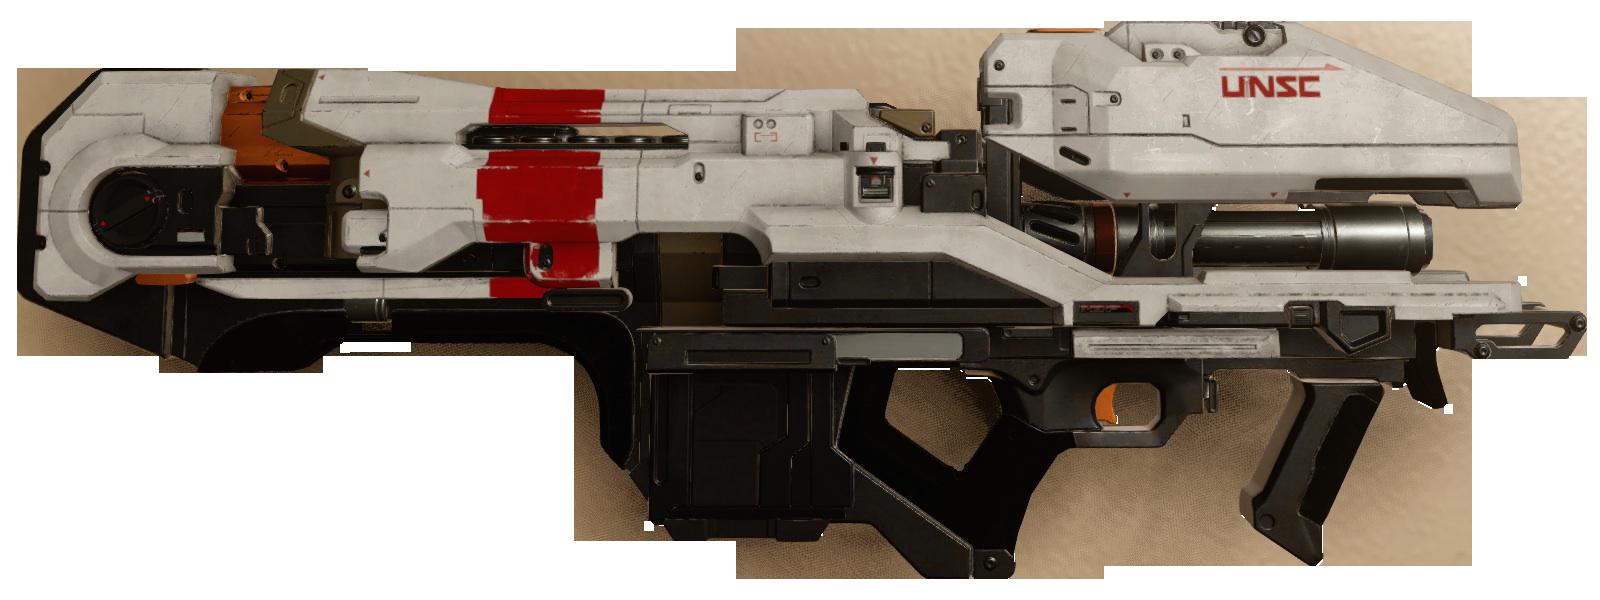 M6/E Grindell/Galilean Nonlinear Rifle